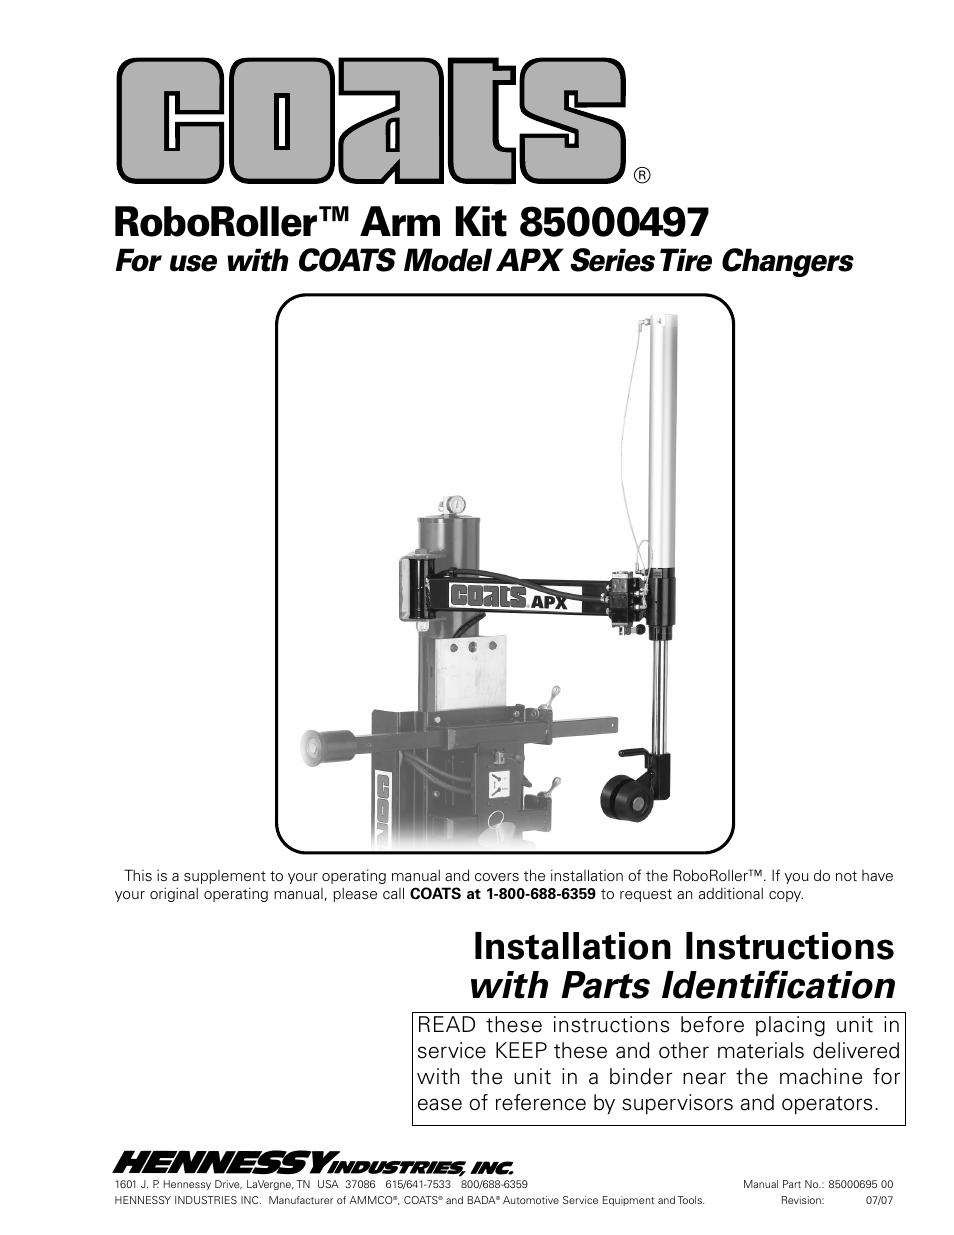 coats kit 85000497 roboroller arm user manual 4 pages rh manualsdir com Ammco Model 4000 Ammco Tools Inc